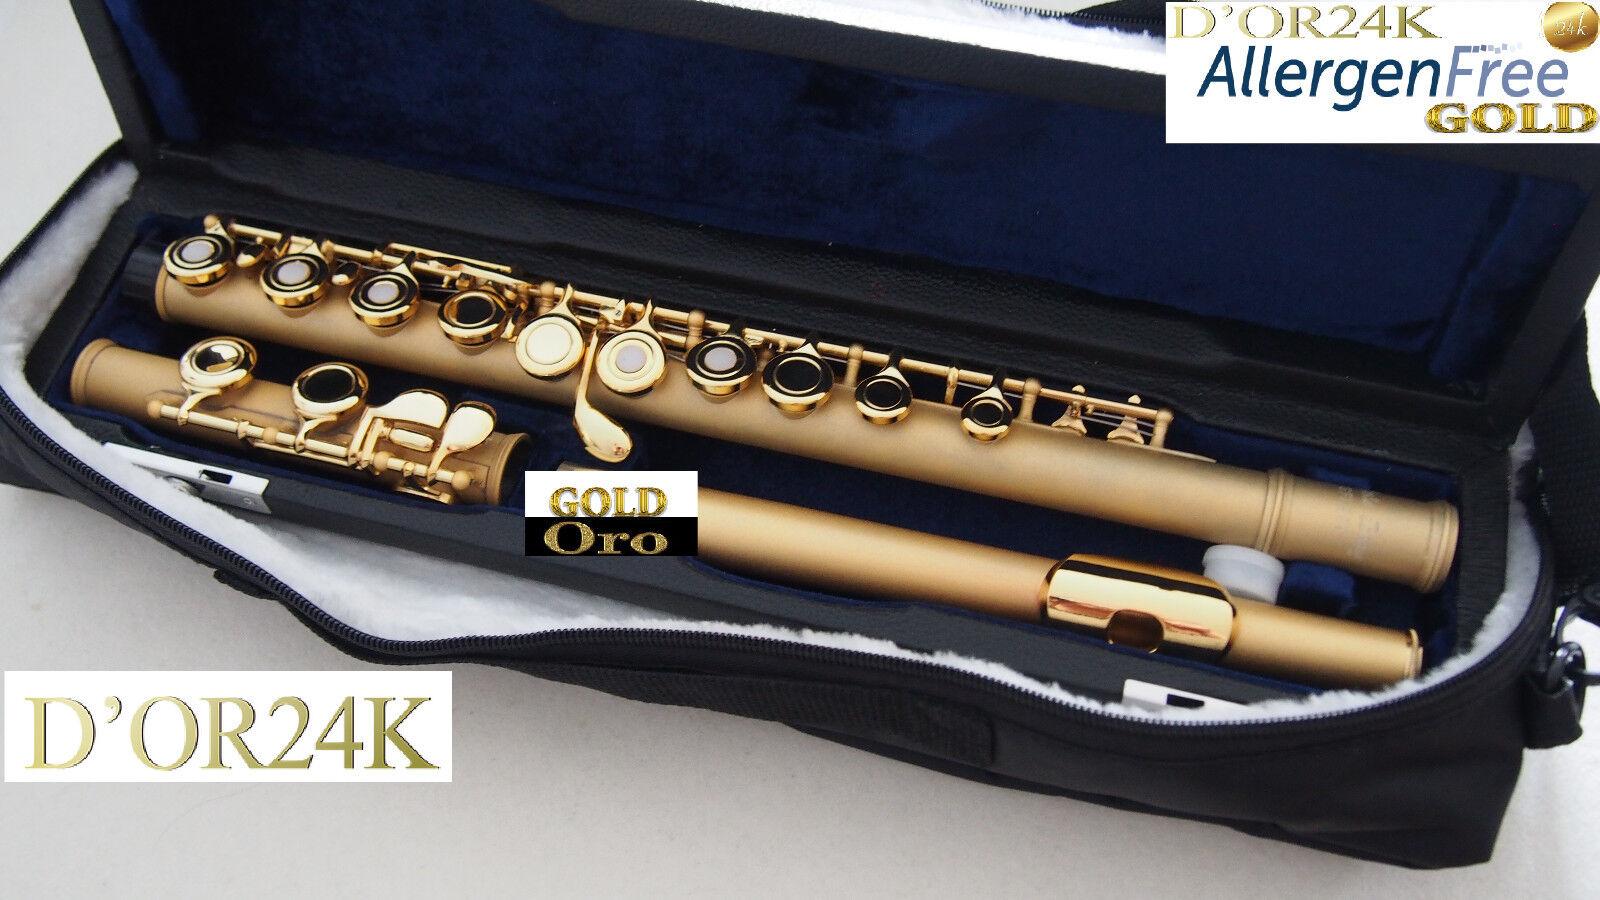 Querflöte Gold  24 Kt 999,9  Sandgestrahlt Gold pl Flute Gold, open holes